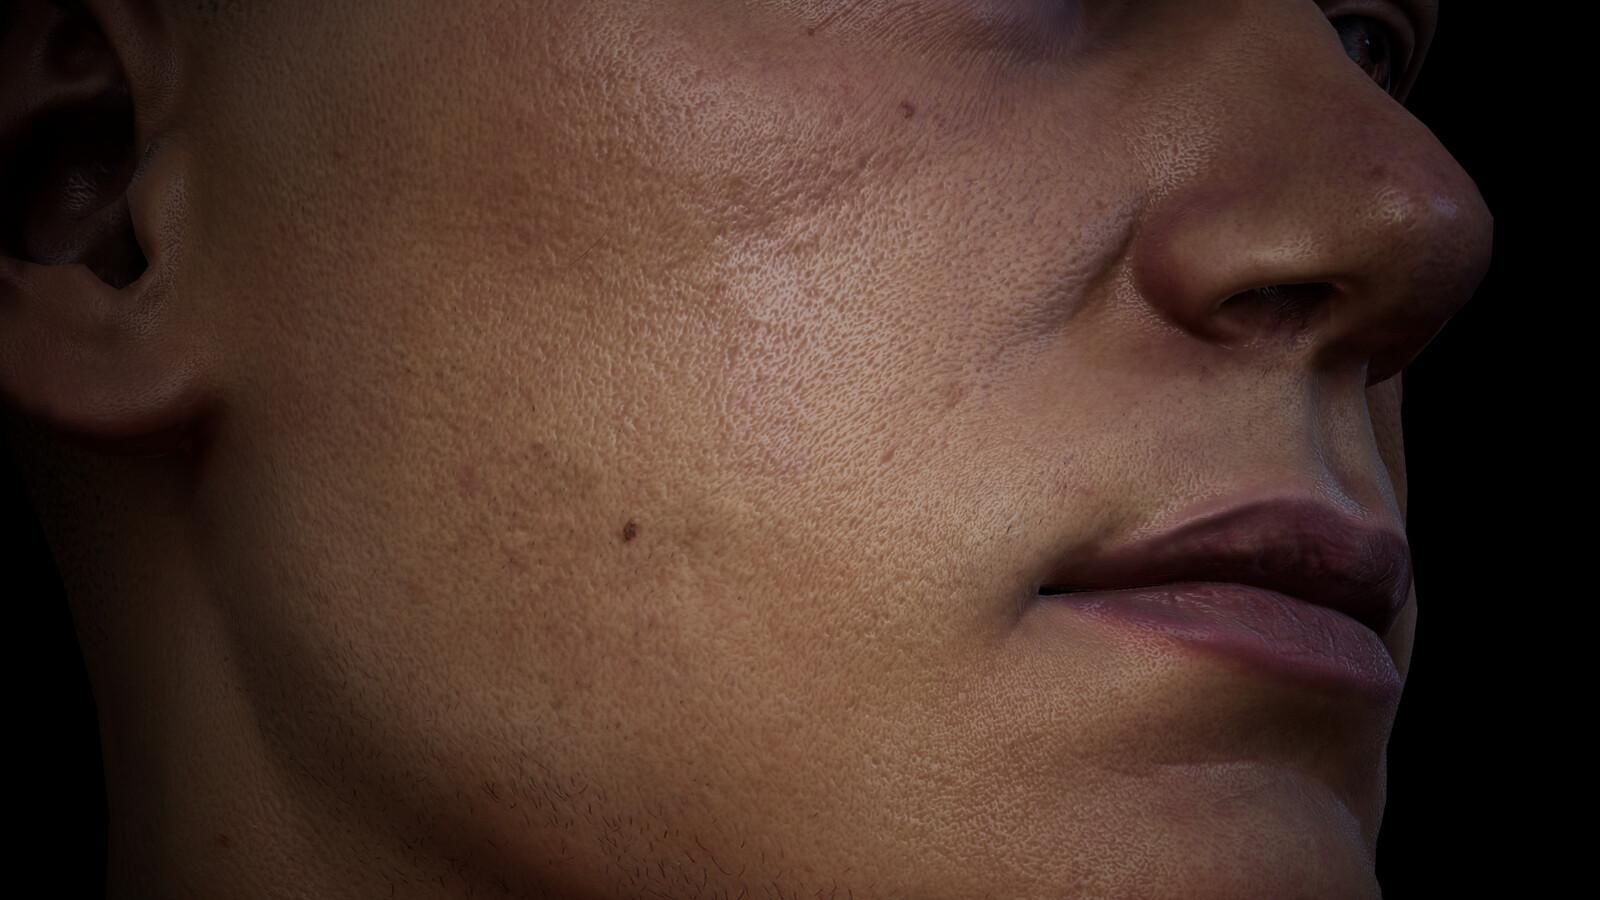 Closeup XYZ pore/wrinkle details